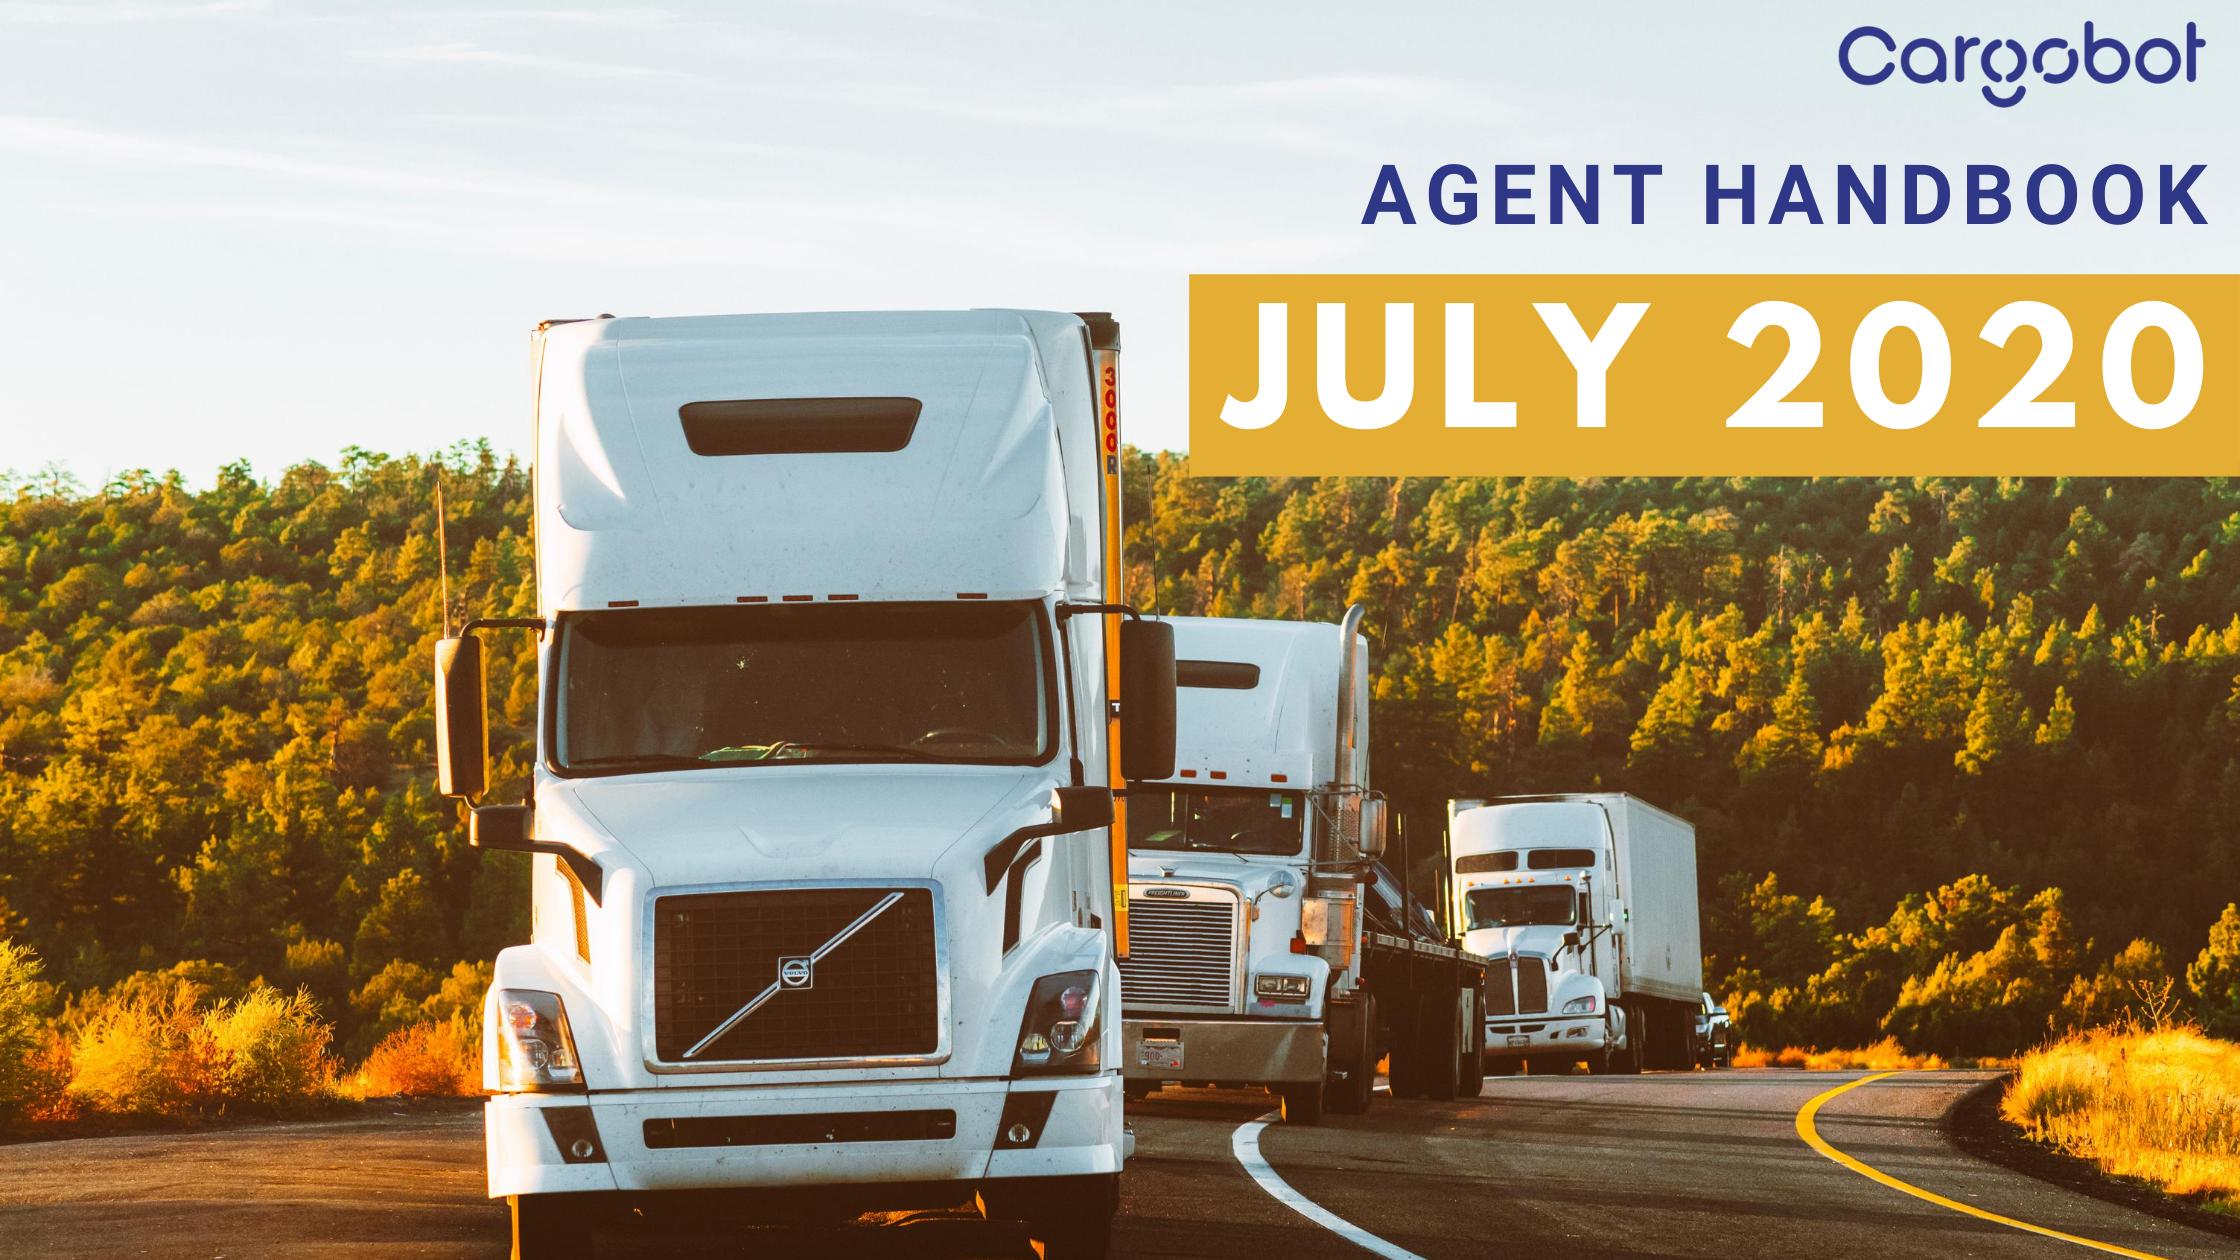 Agent Handbook july 2020